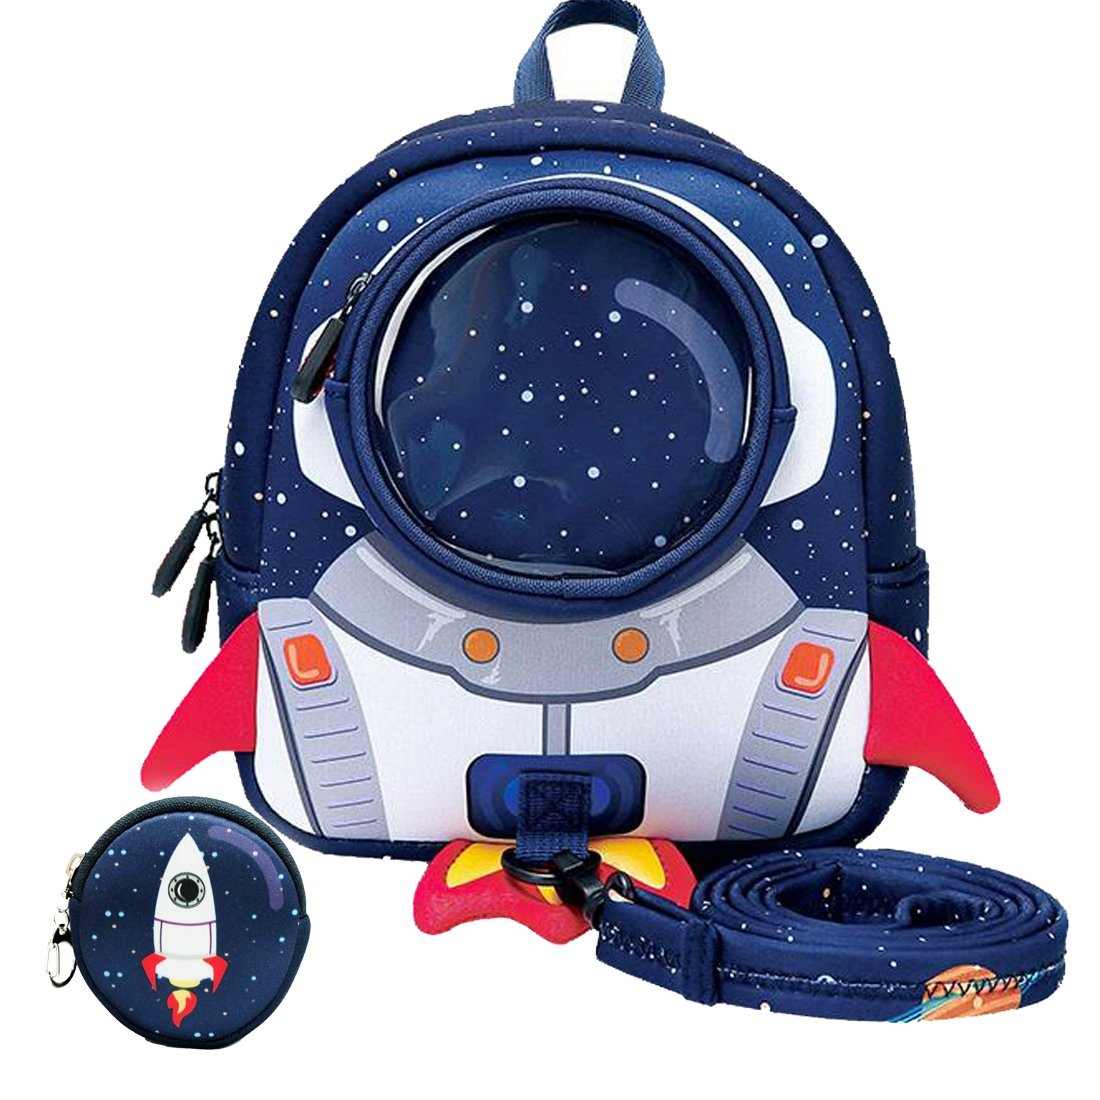 3D Cartoon Kids Dinosaur/Rocket Backpack